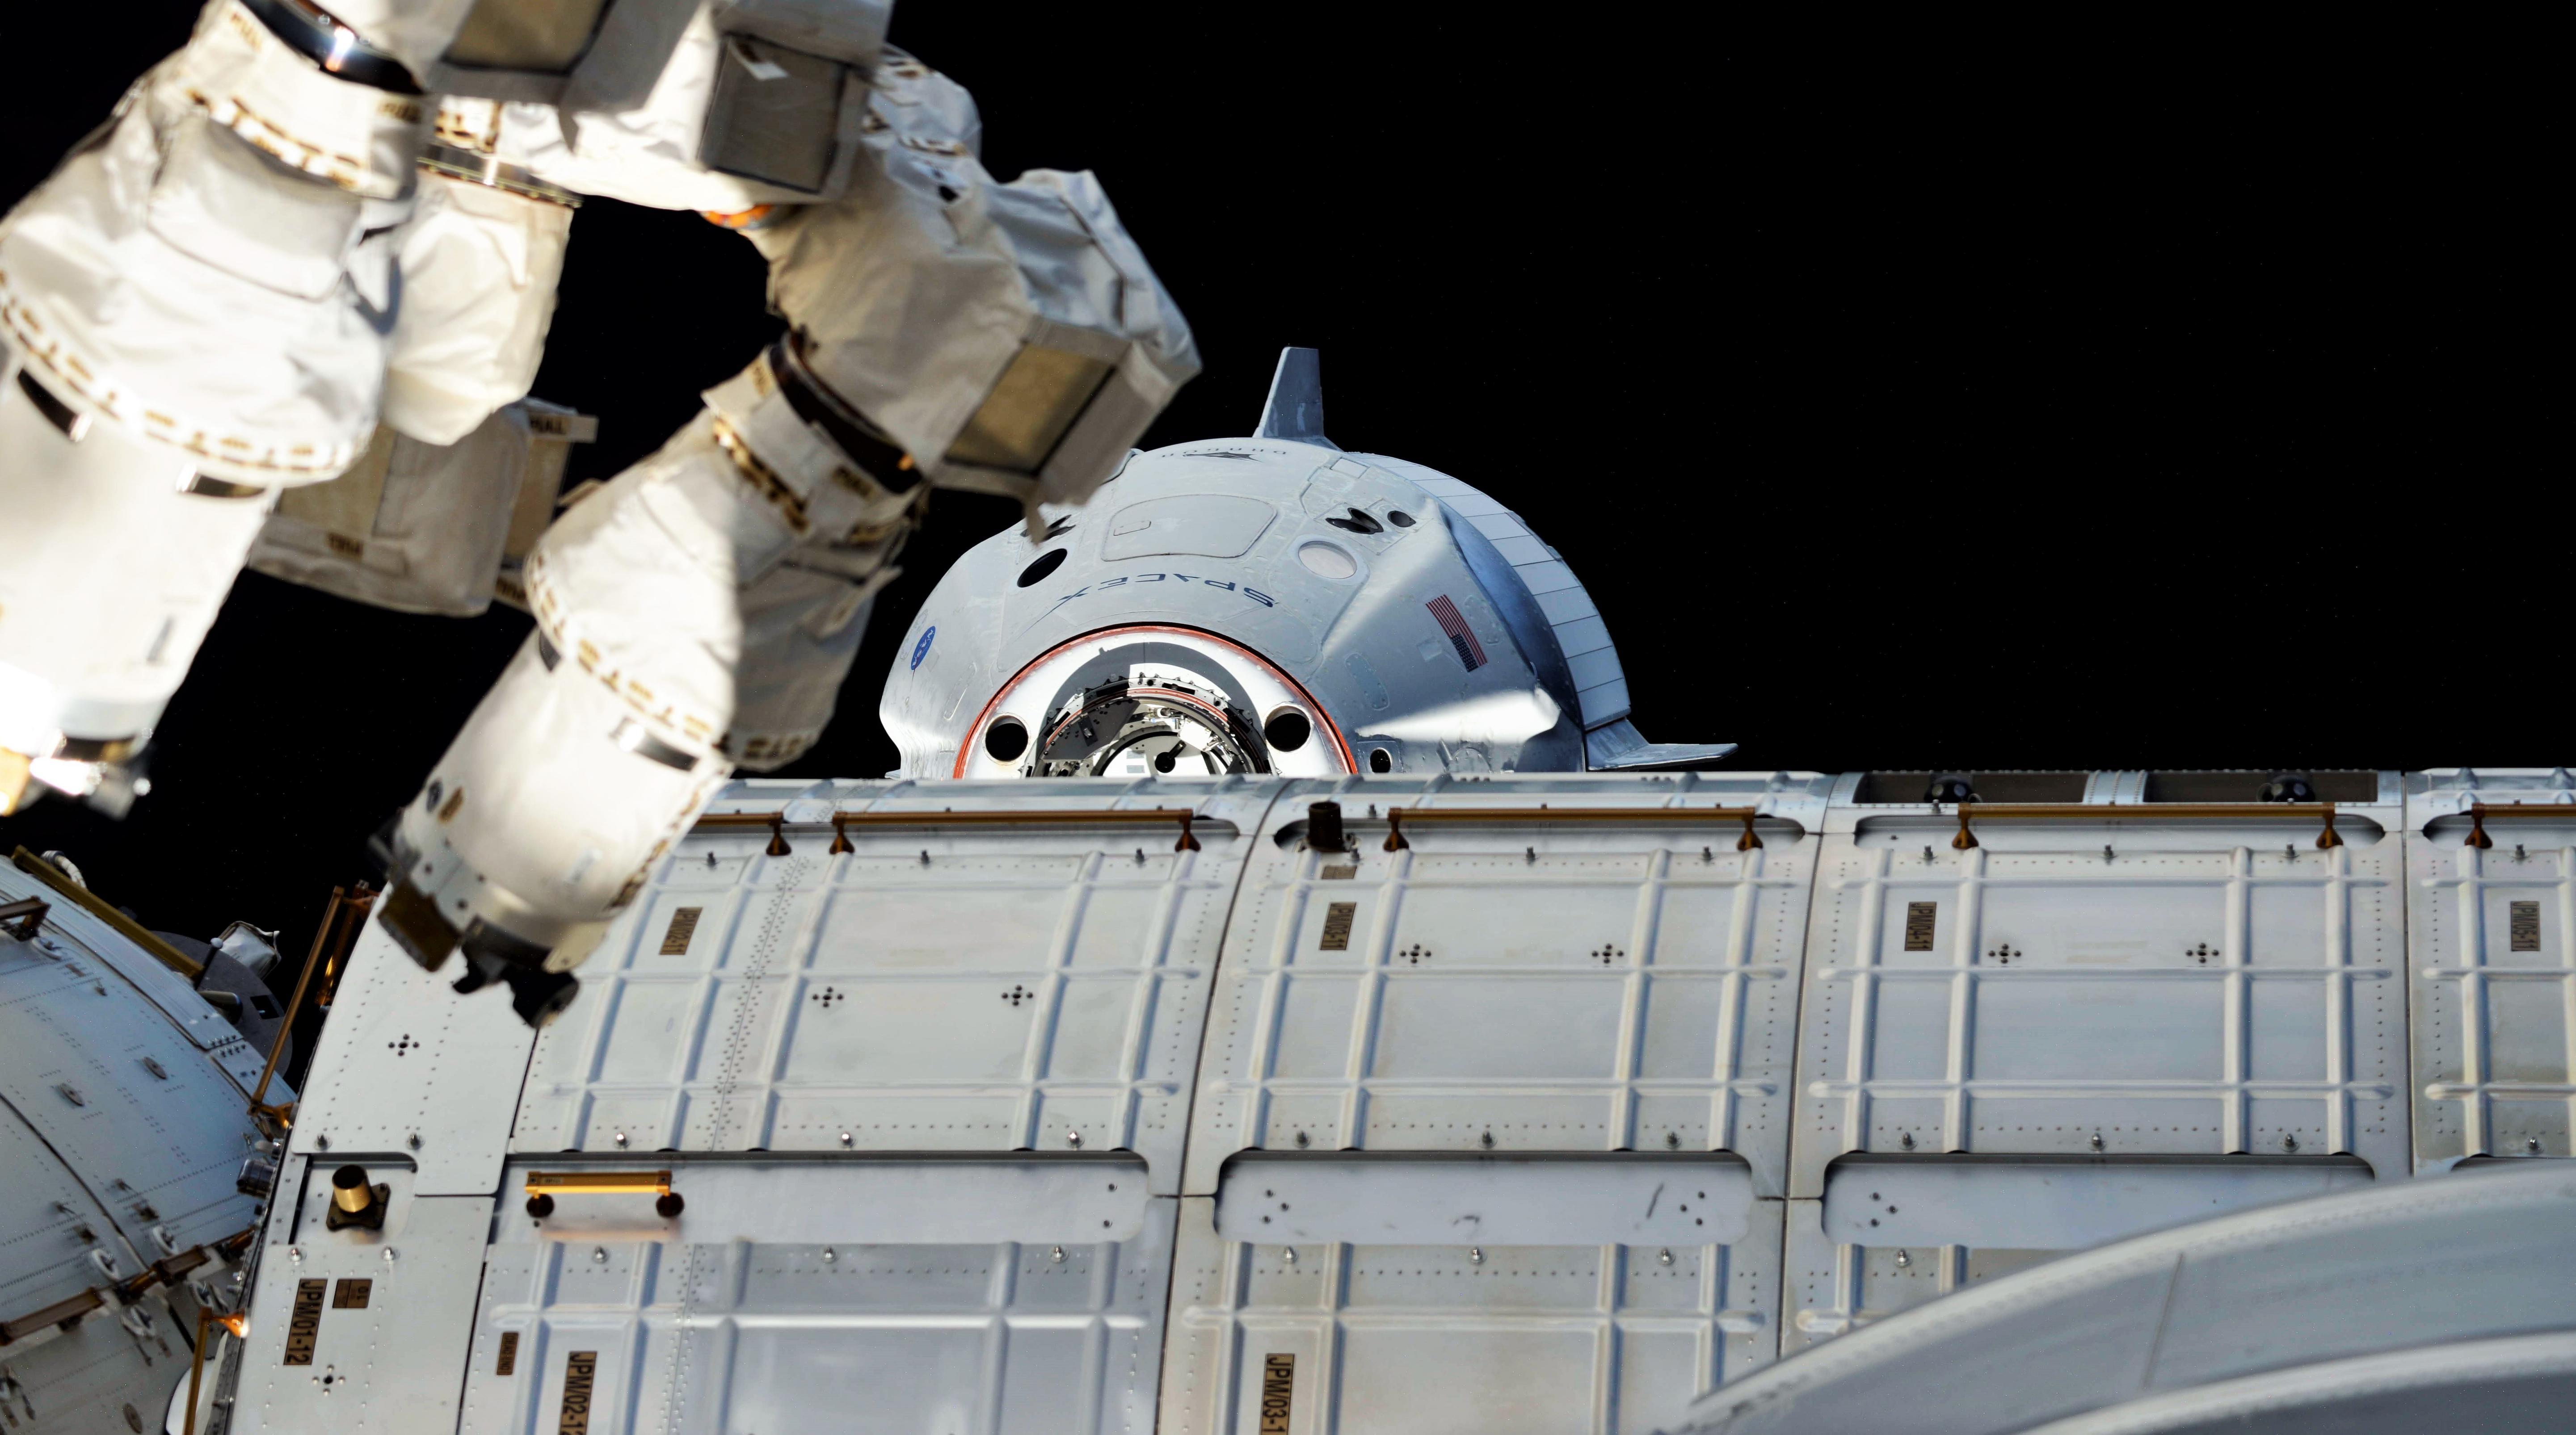 Crew Dragon DM-1 ISS arrival 030319 (Oleg Kononenko) 3 (c)